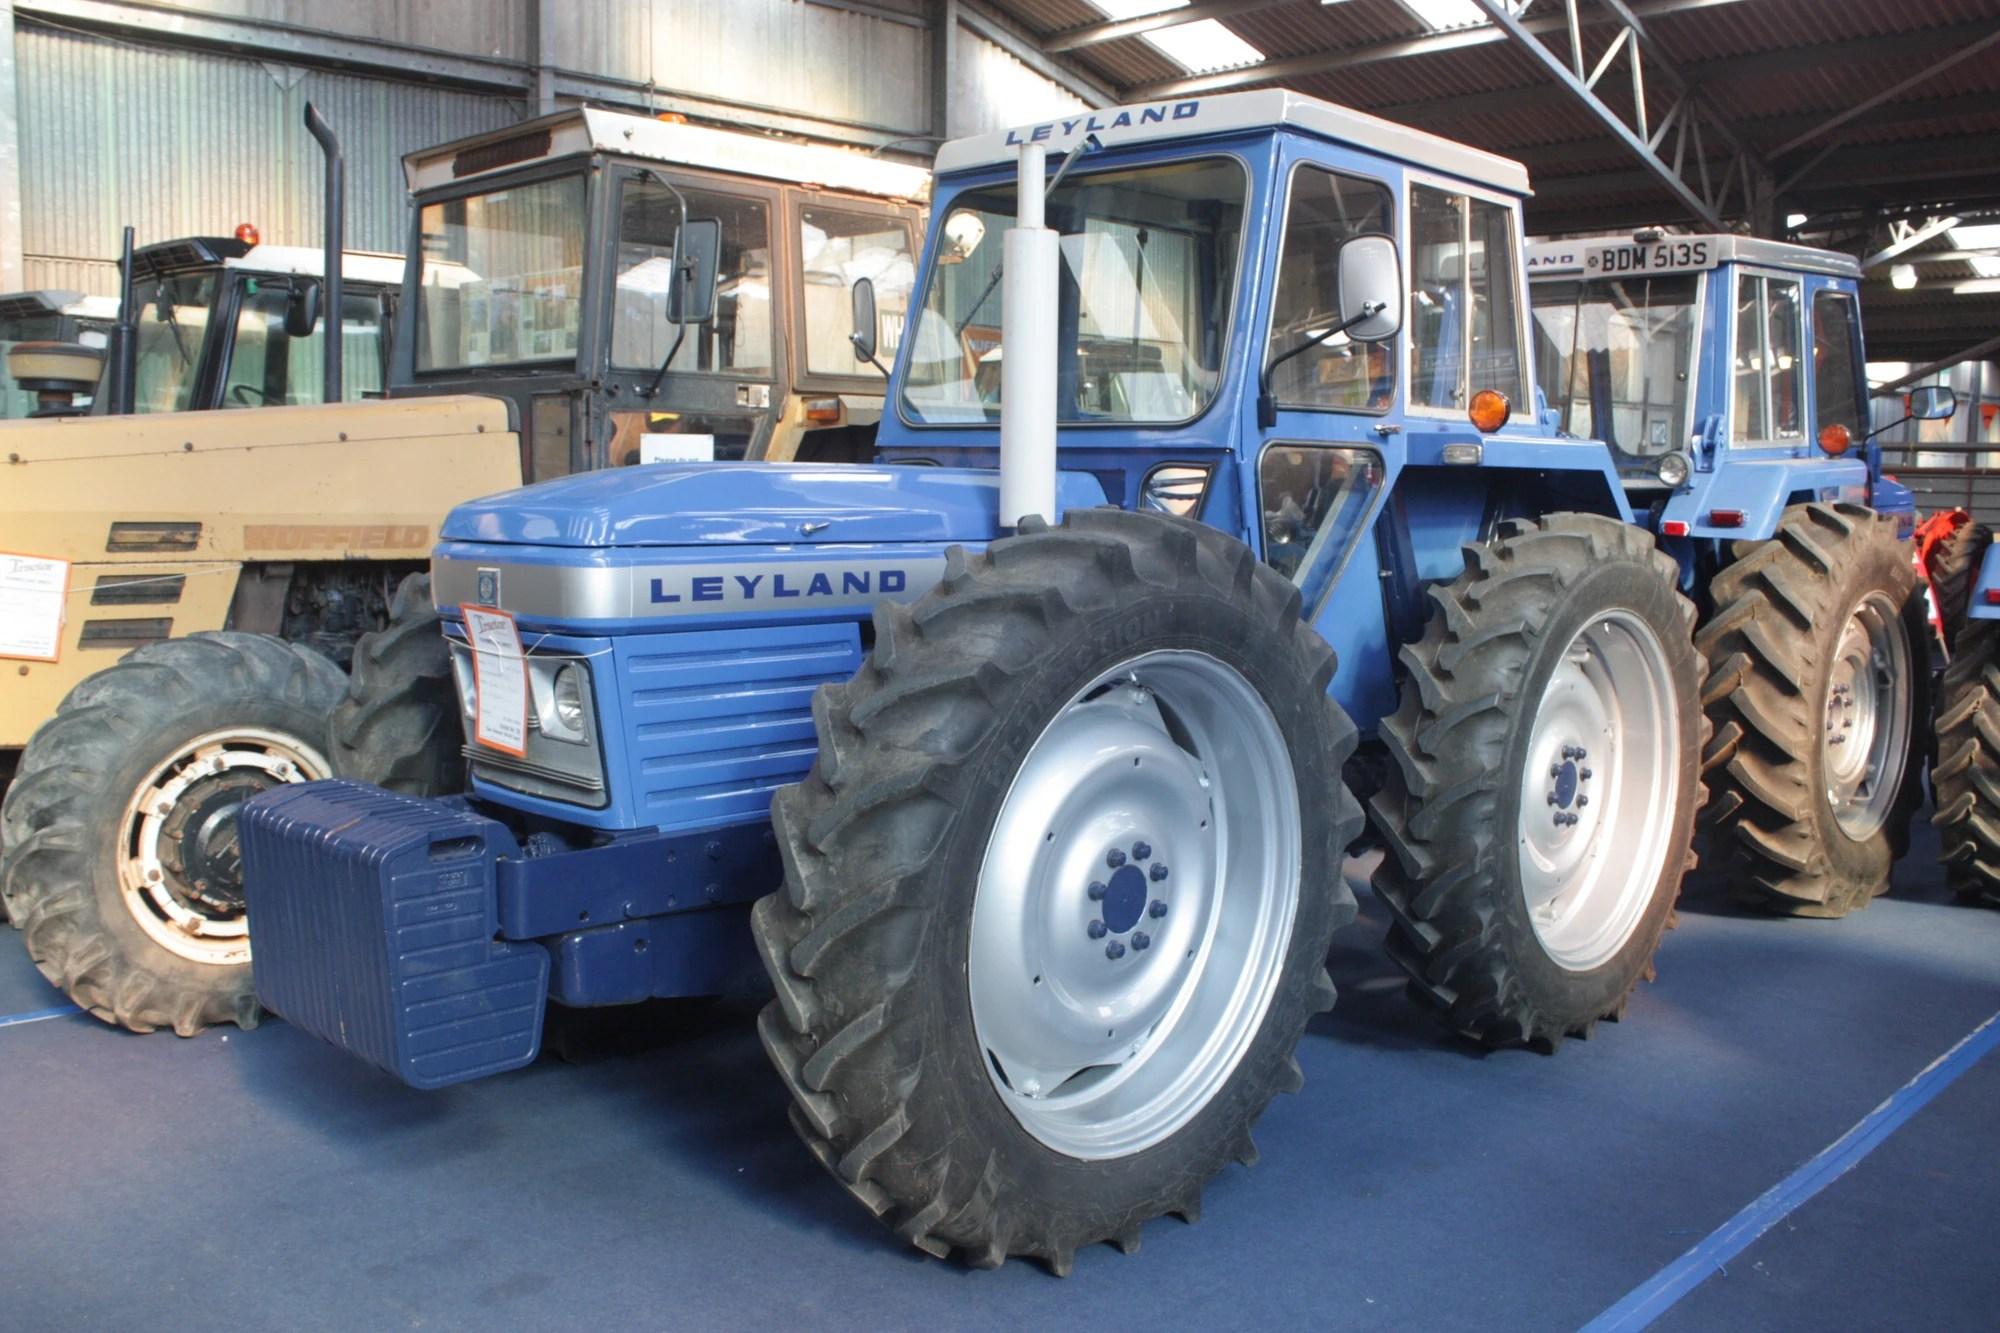 medium resolution of leyland 4100 tractor construction plant wiki fandom powered by wikia